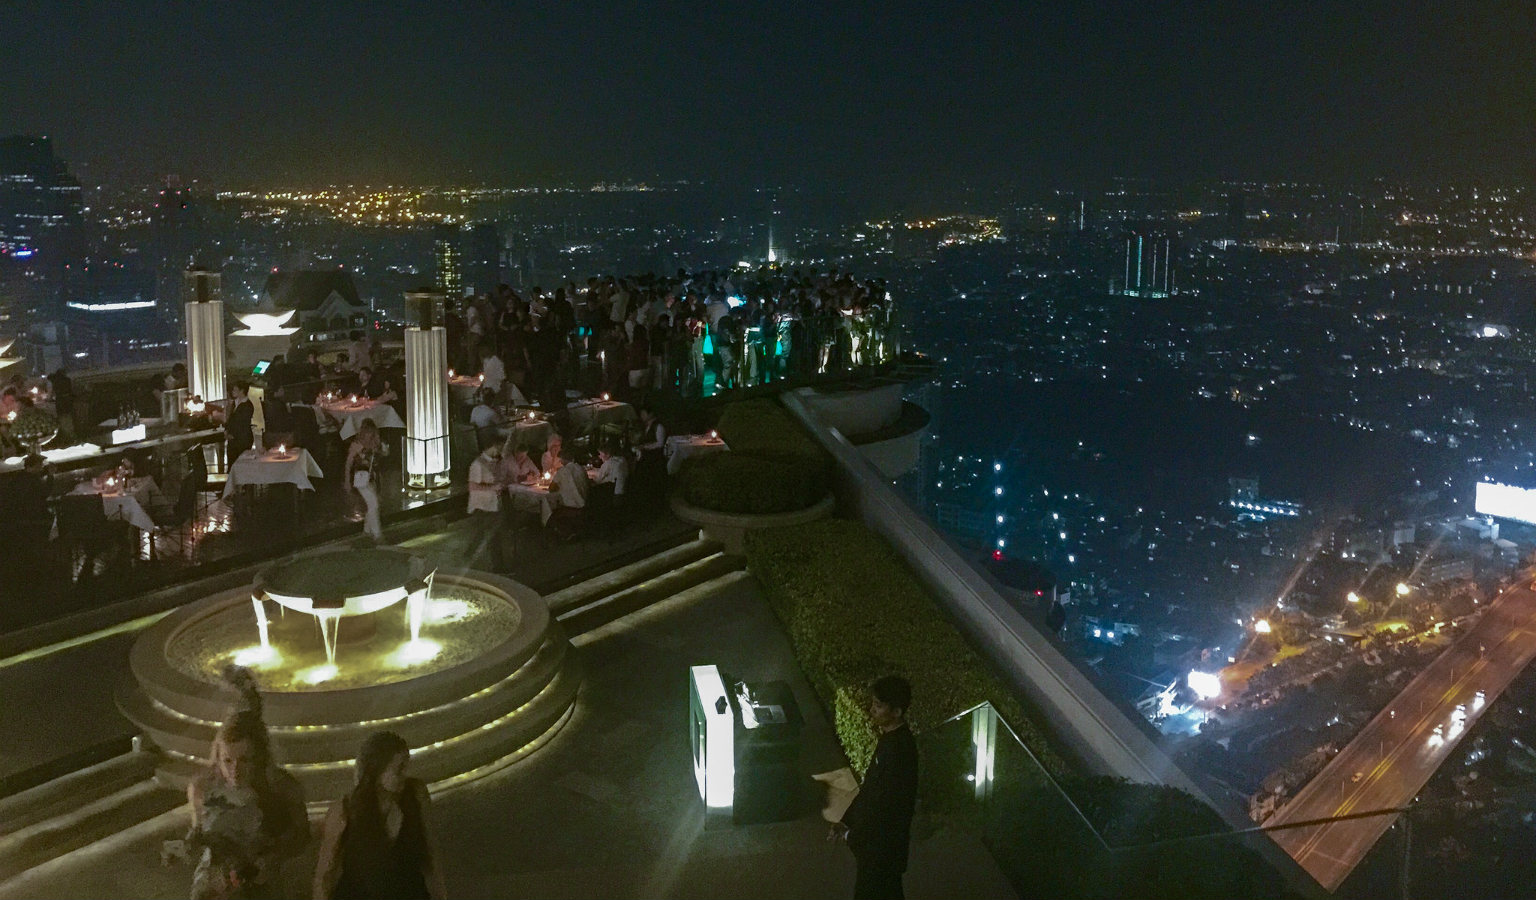 de Sky Bar @ Lebua, in de avond druk met mensen rondom